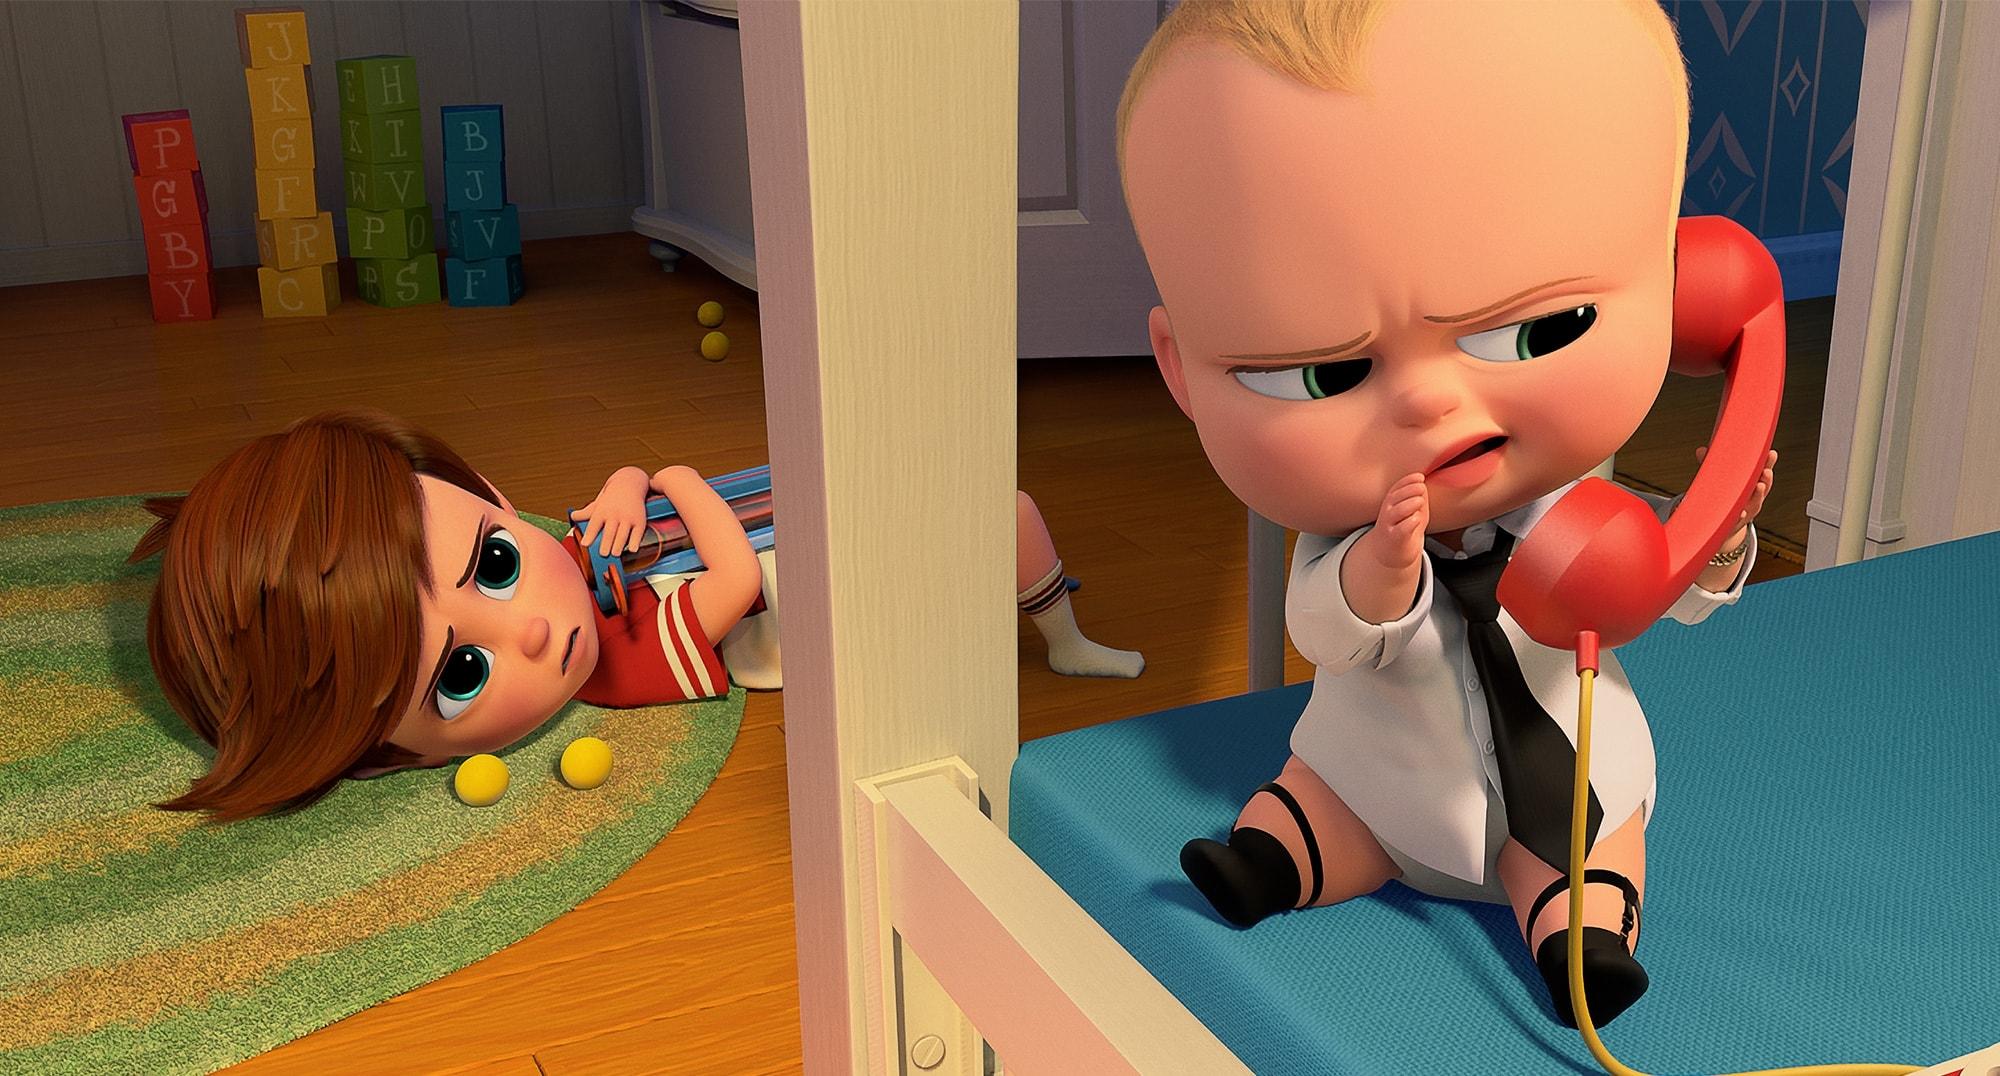 انیمیشن The Boss Baby محصول ۲۰۱۷